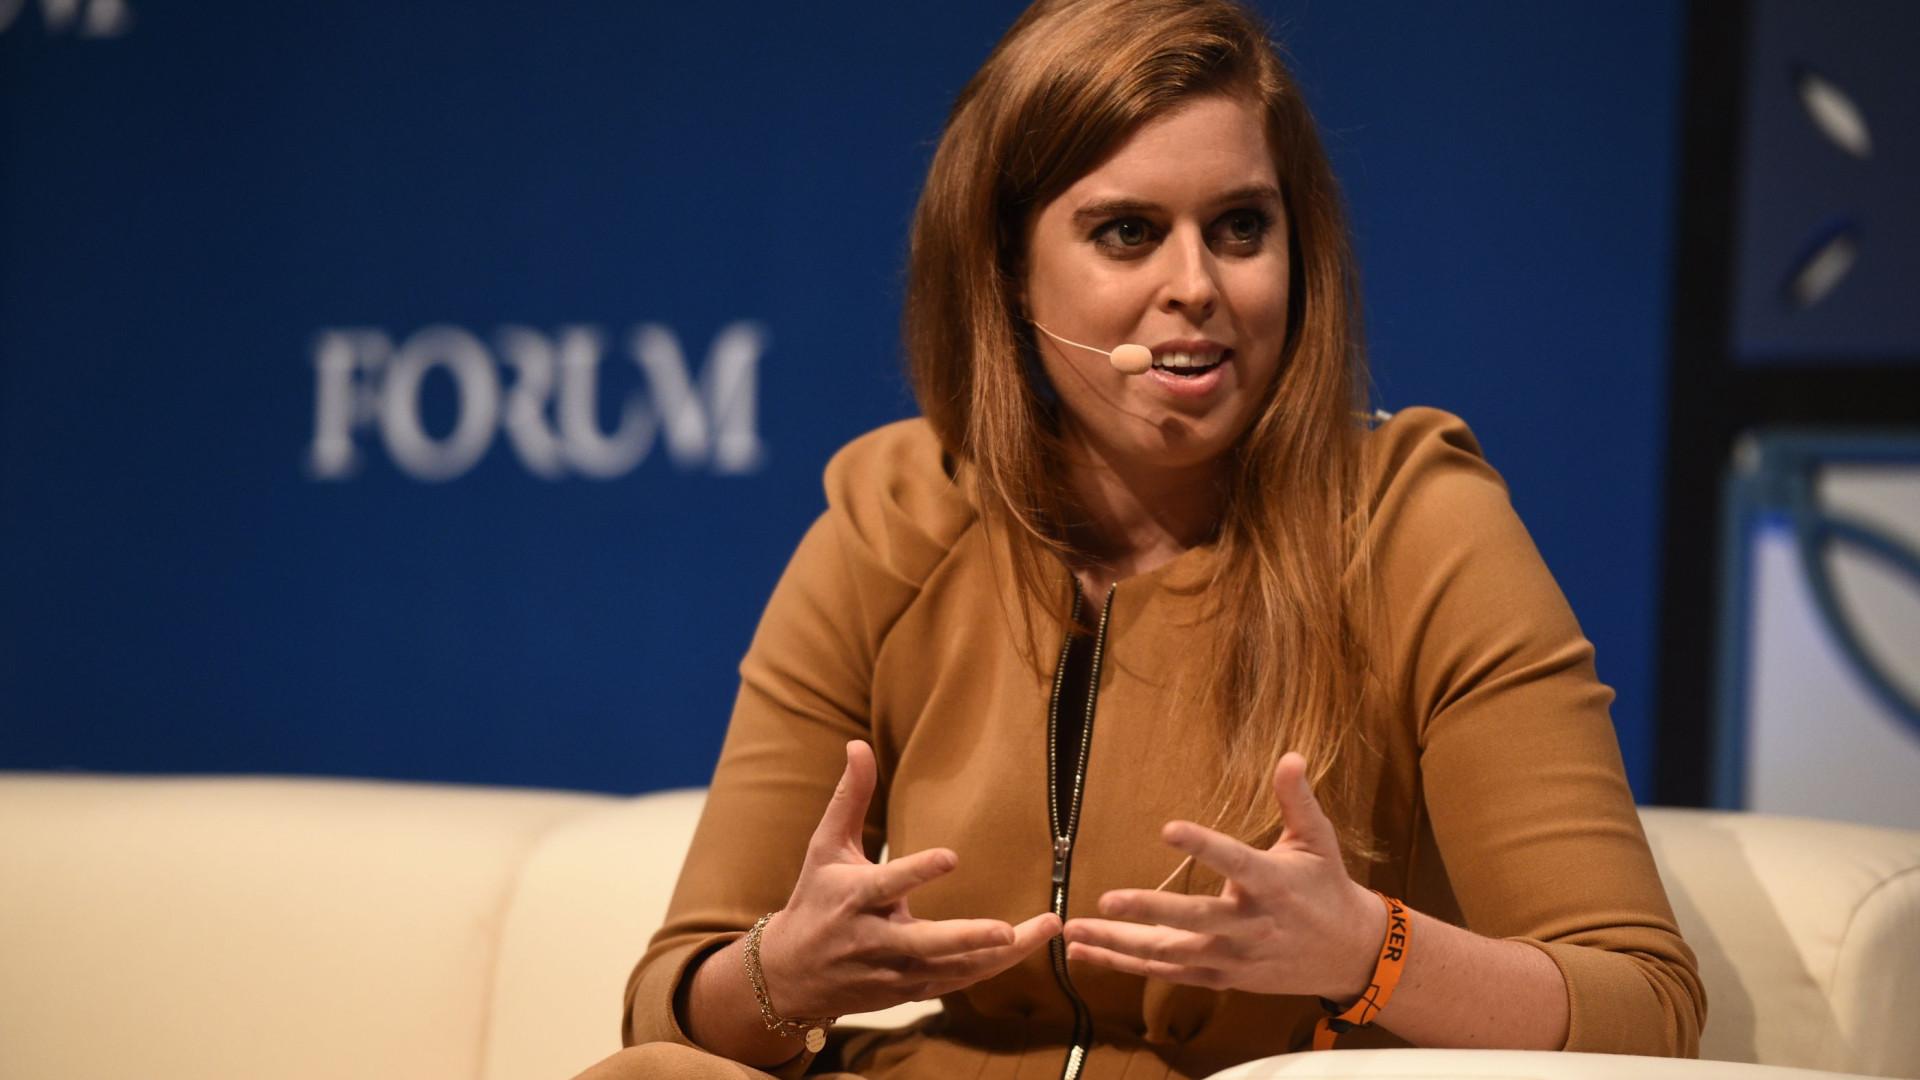 Princesa Beatrice em Portugal como convidada da Web Summit